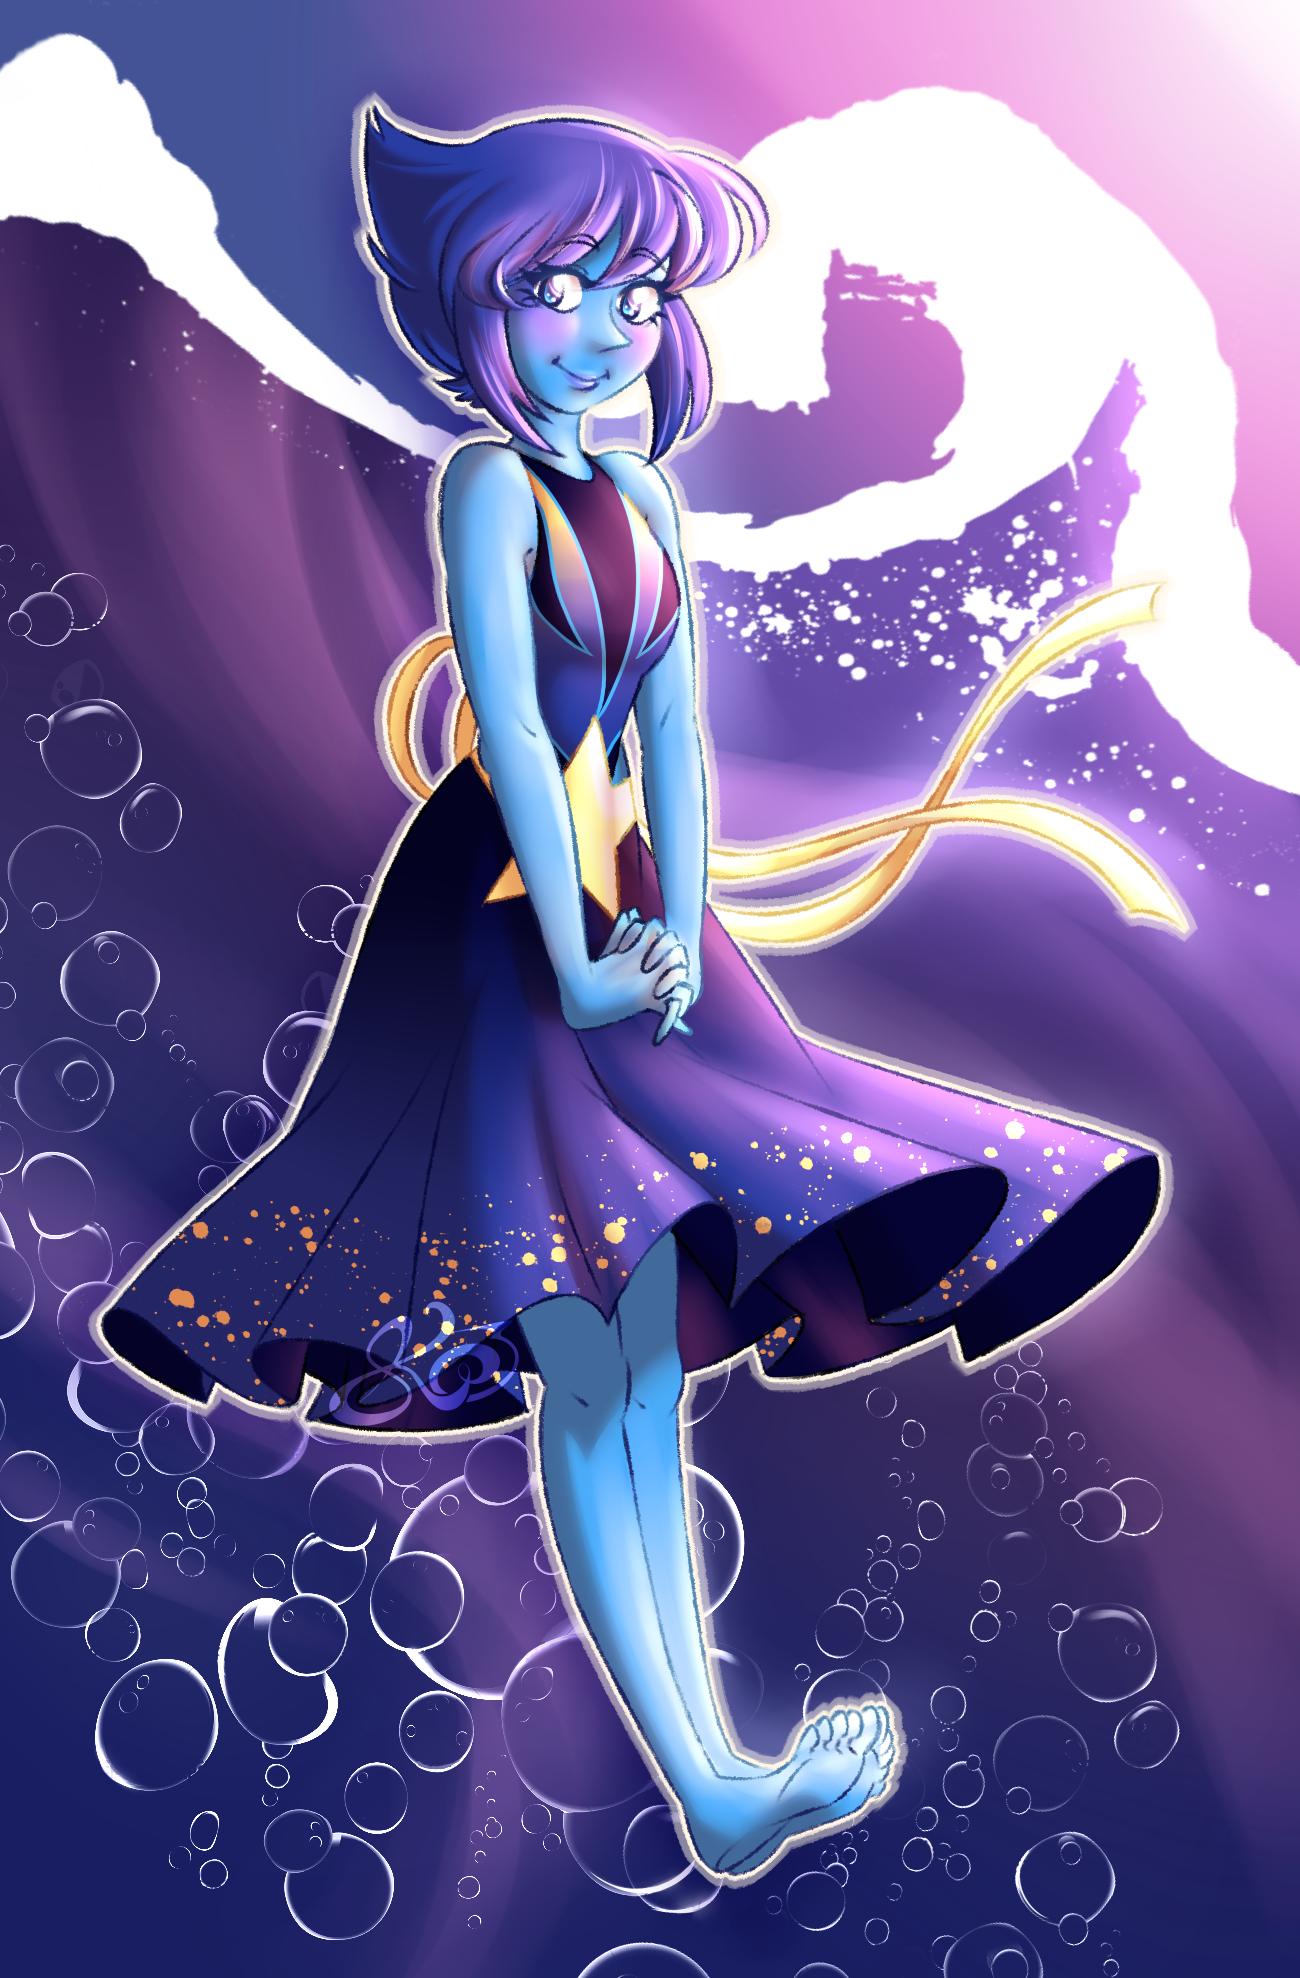 Reformed Lazuli